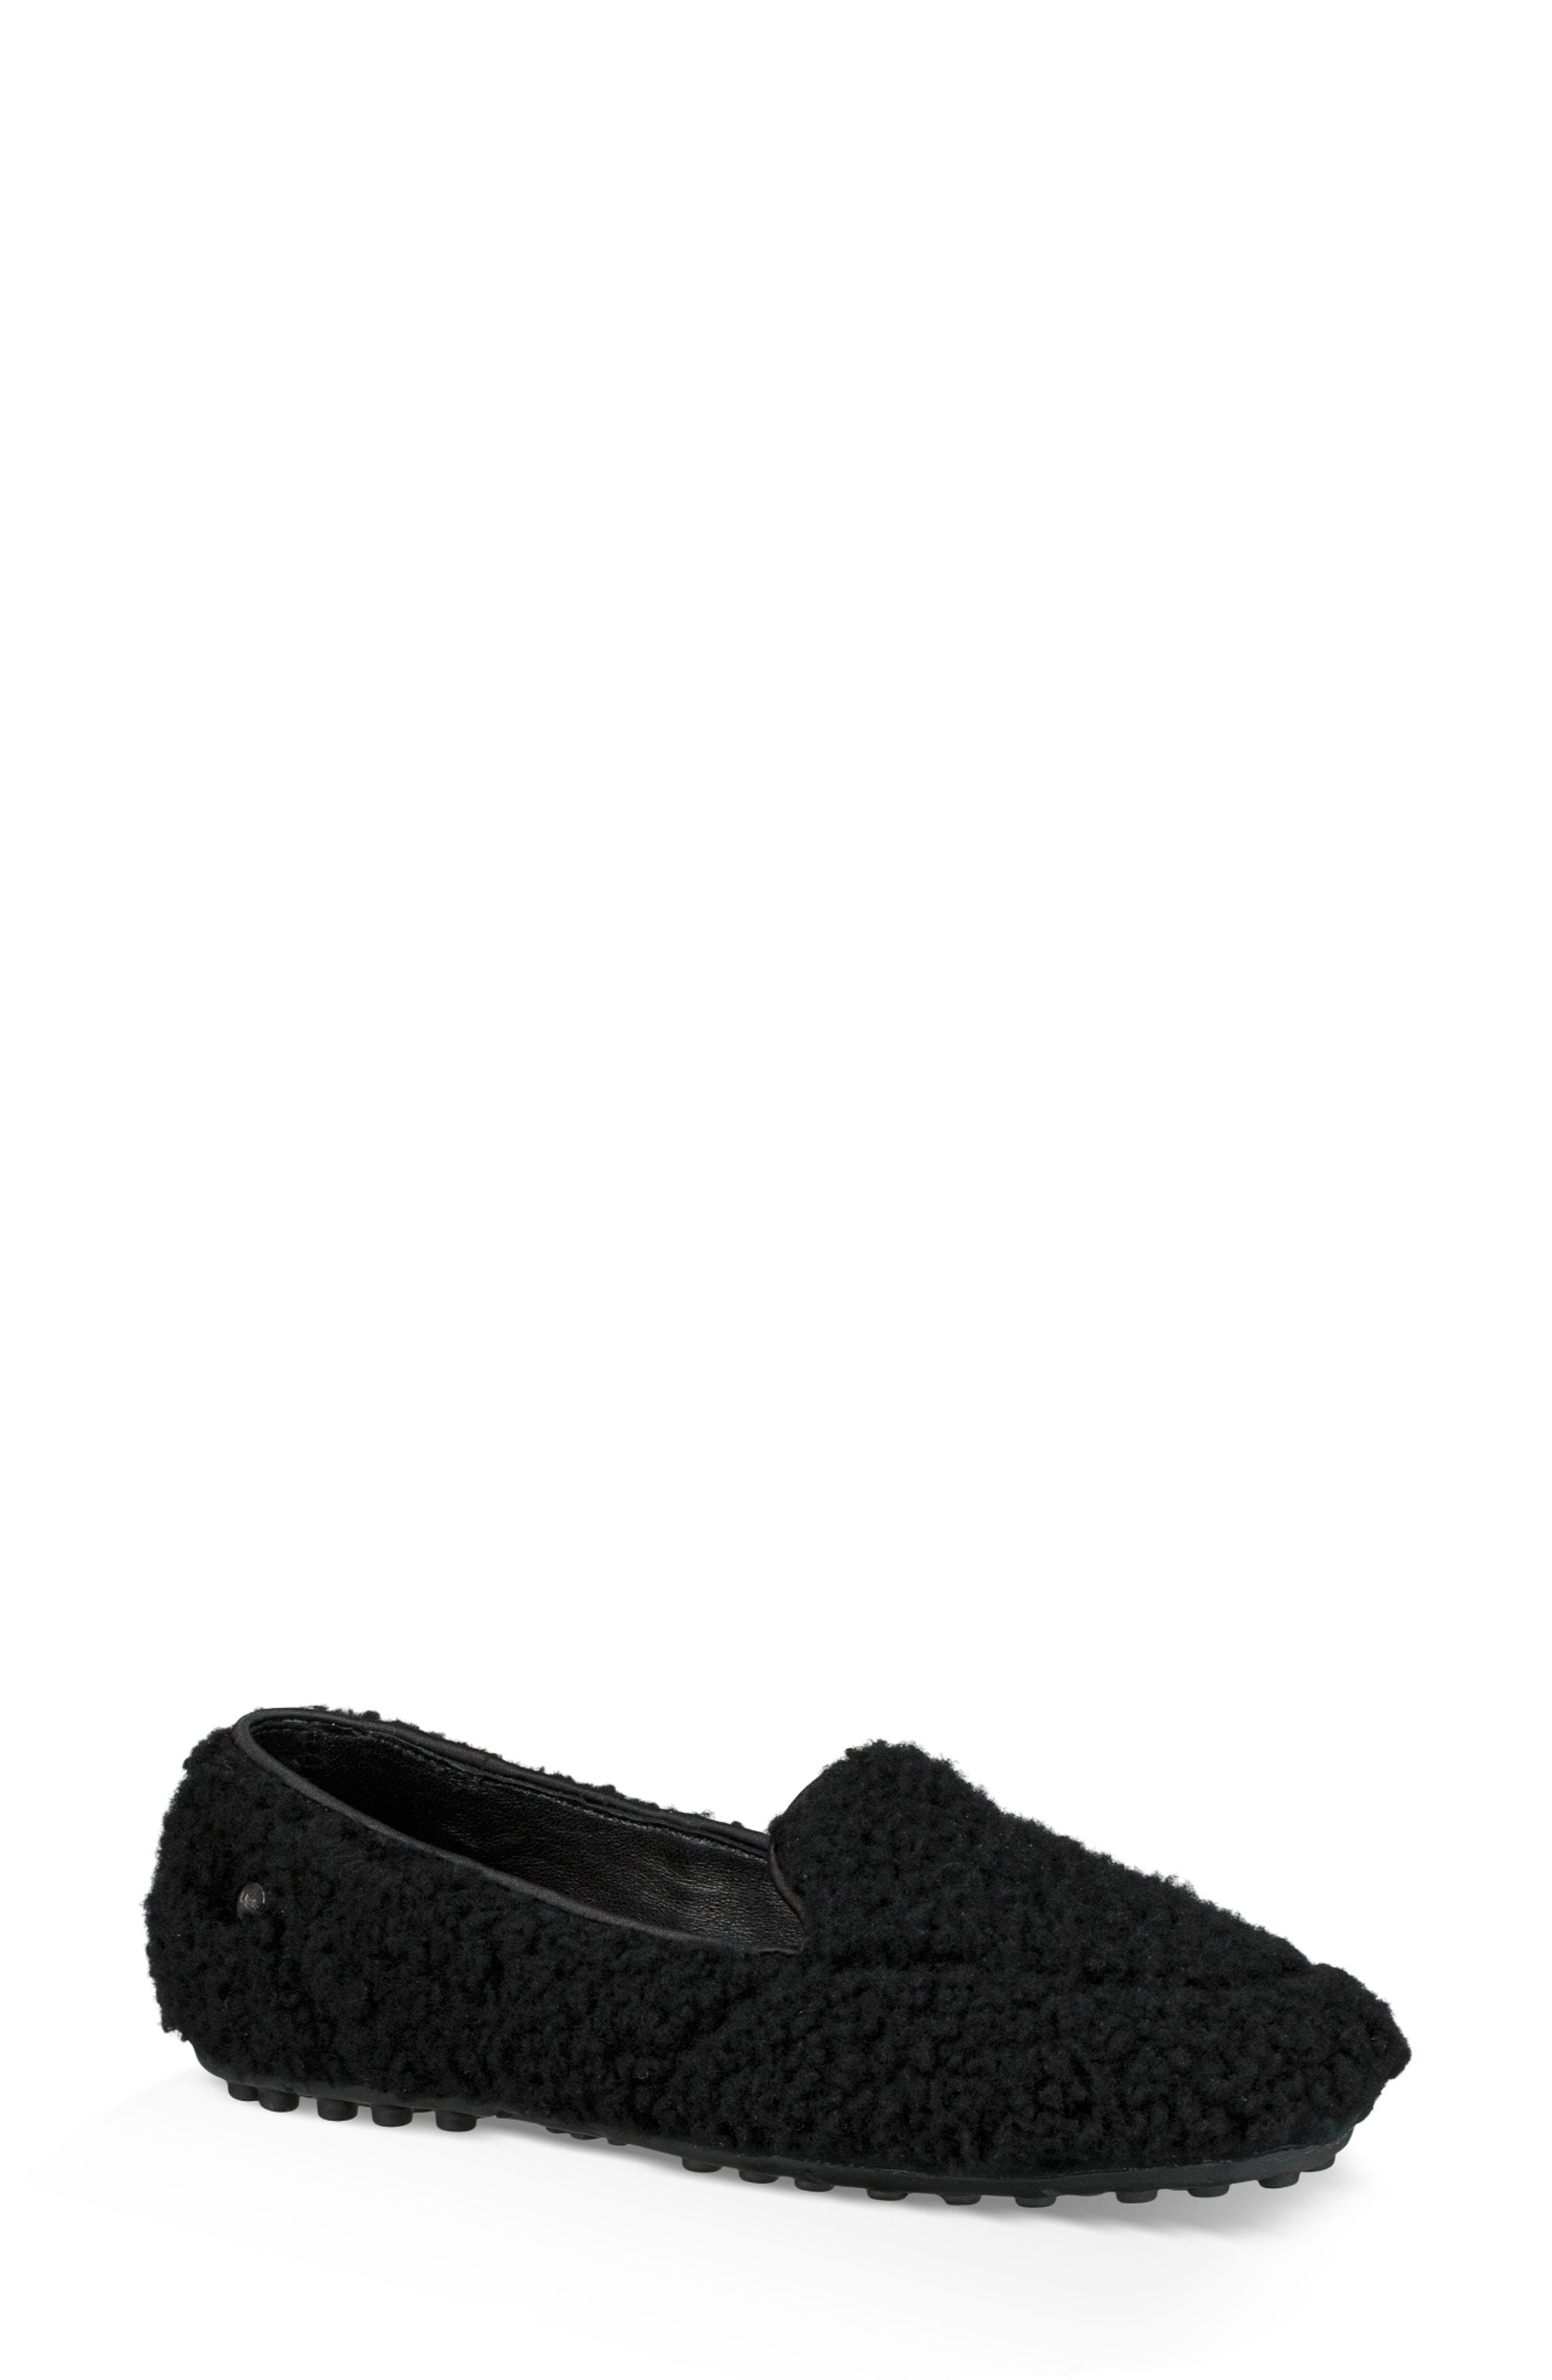 fac559c537d Lyst - UGG Ugg Hailey Fluff Genuine Shearling Slipper in Black